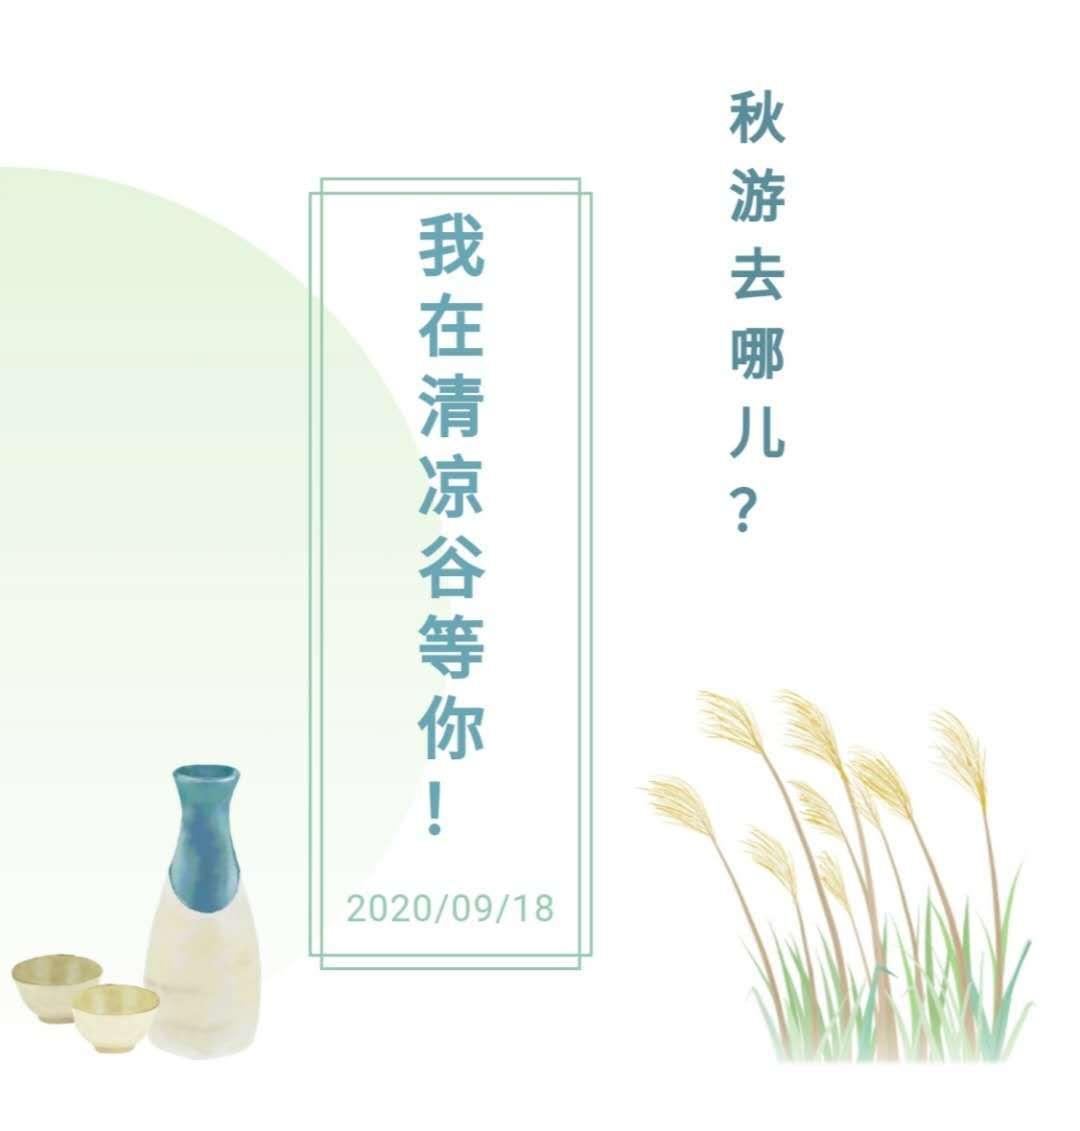 http://www.weixinrensheng.com/lvyou/2384233.html